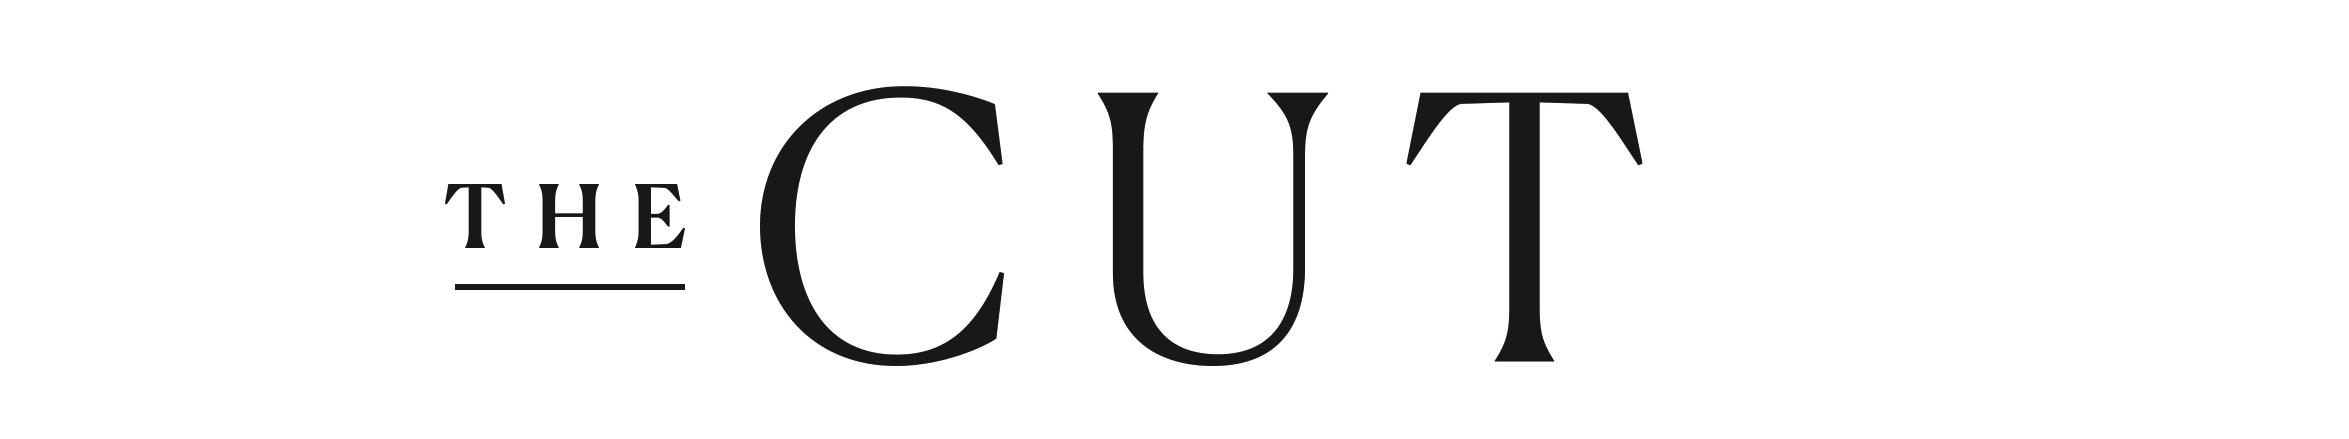 the cut logo-min.png